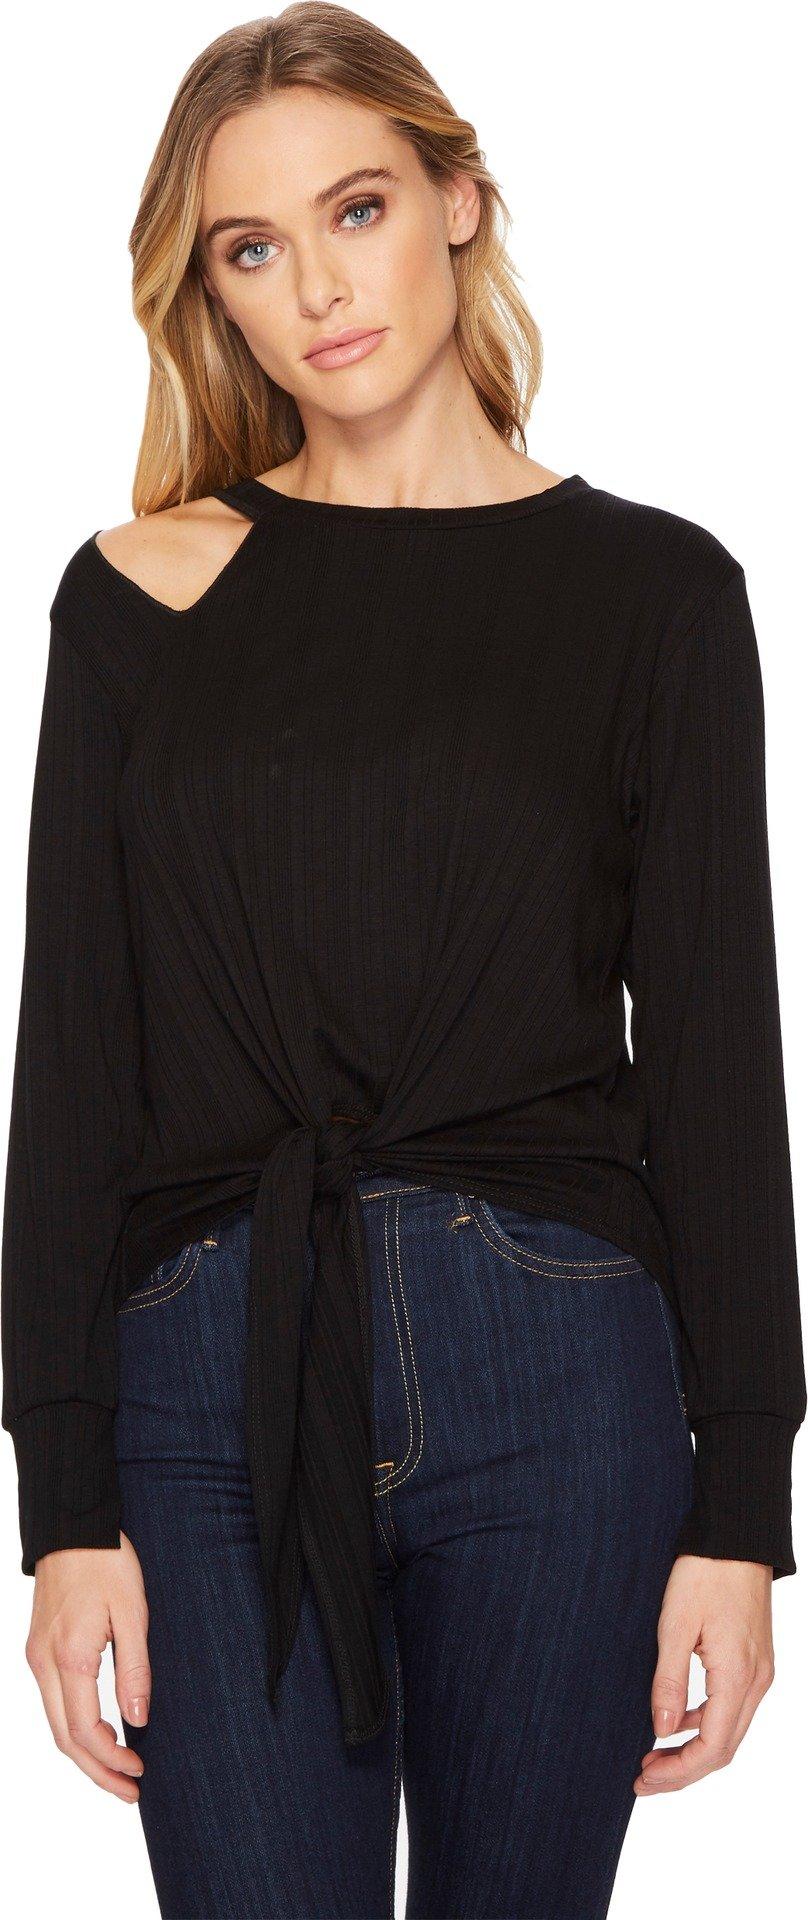 LNA Women's Lurque Ribbed Tie Front Tee, Black, Medium